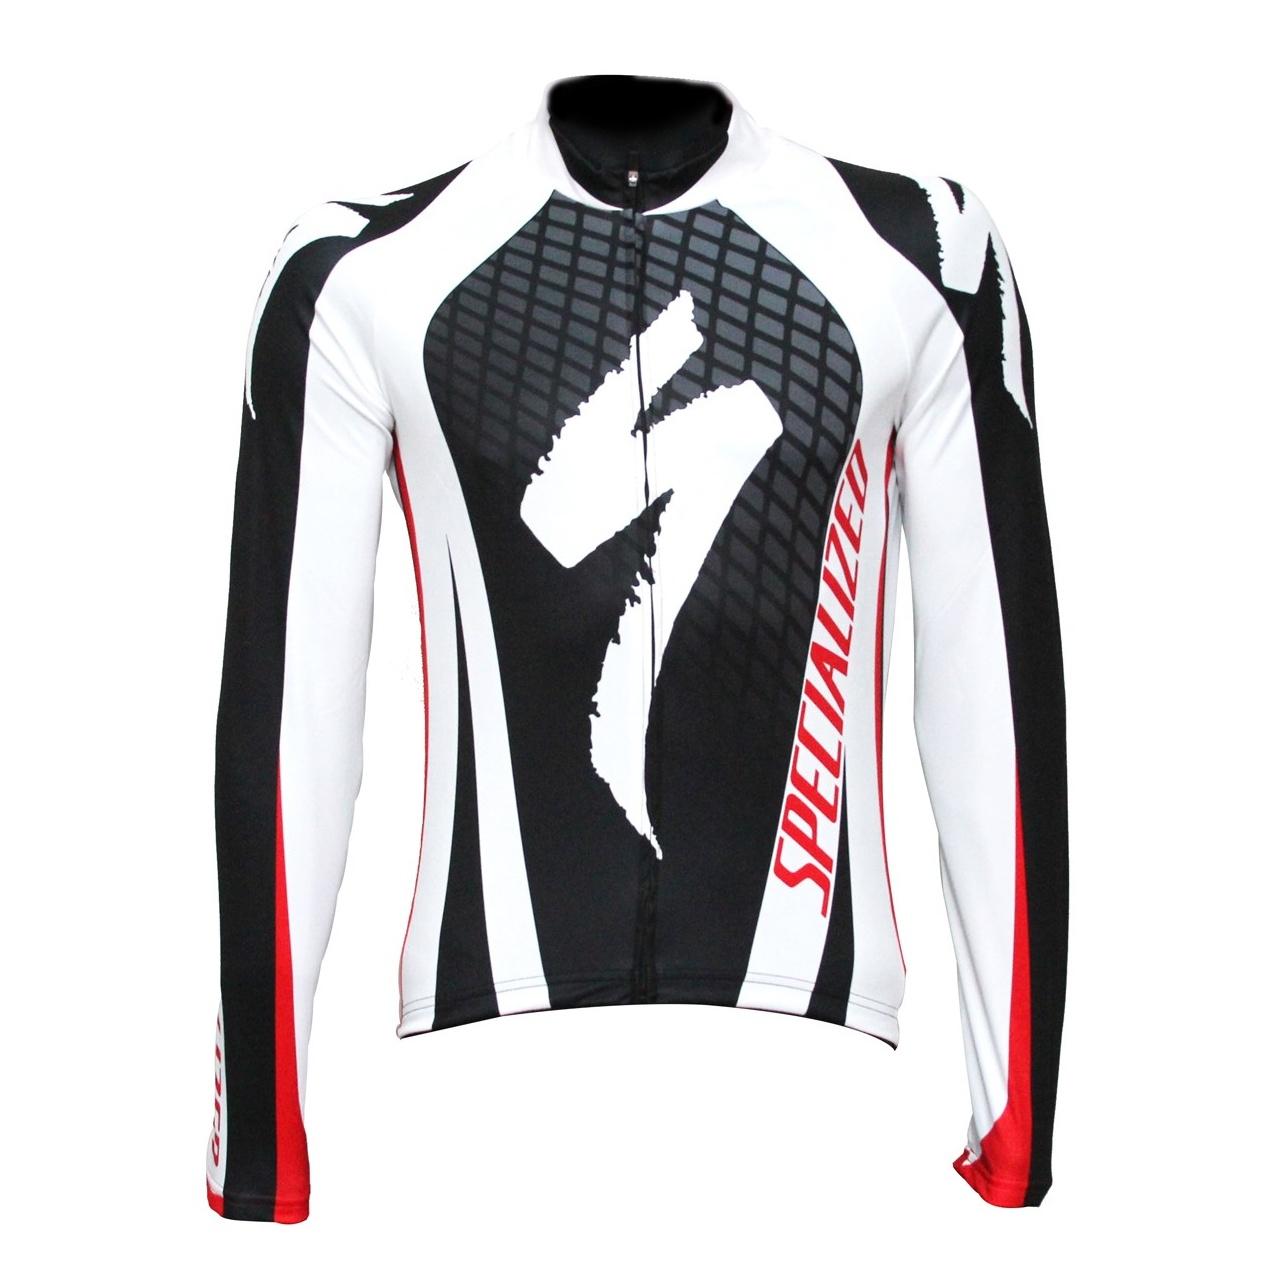 پیراهن وزرشی مردانه اسپشیالایزد مدل Comp Racing 644-4763